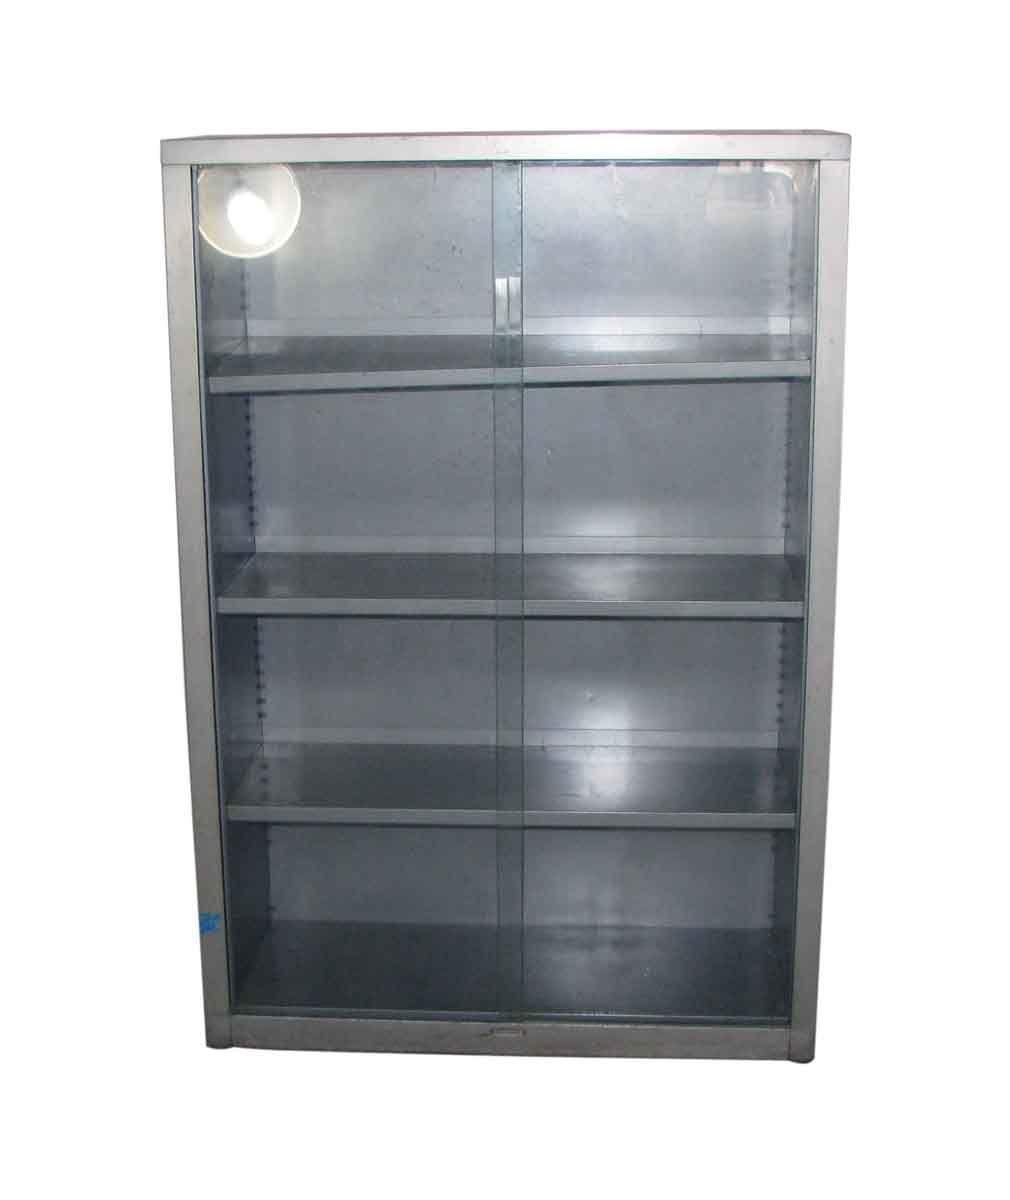 Vintage Metal Book Case With Glass Sliding Doors Sliding Glass Door Vintage Metal Cabinet Metal Shelves